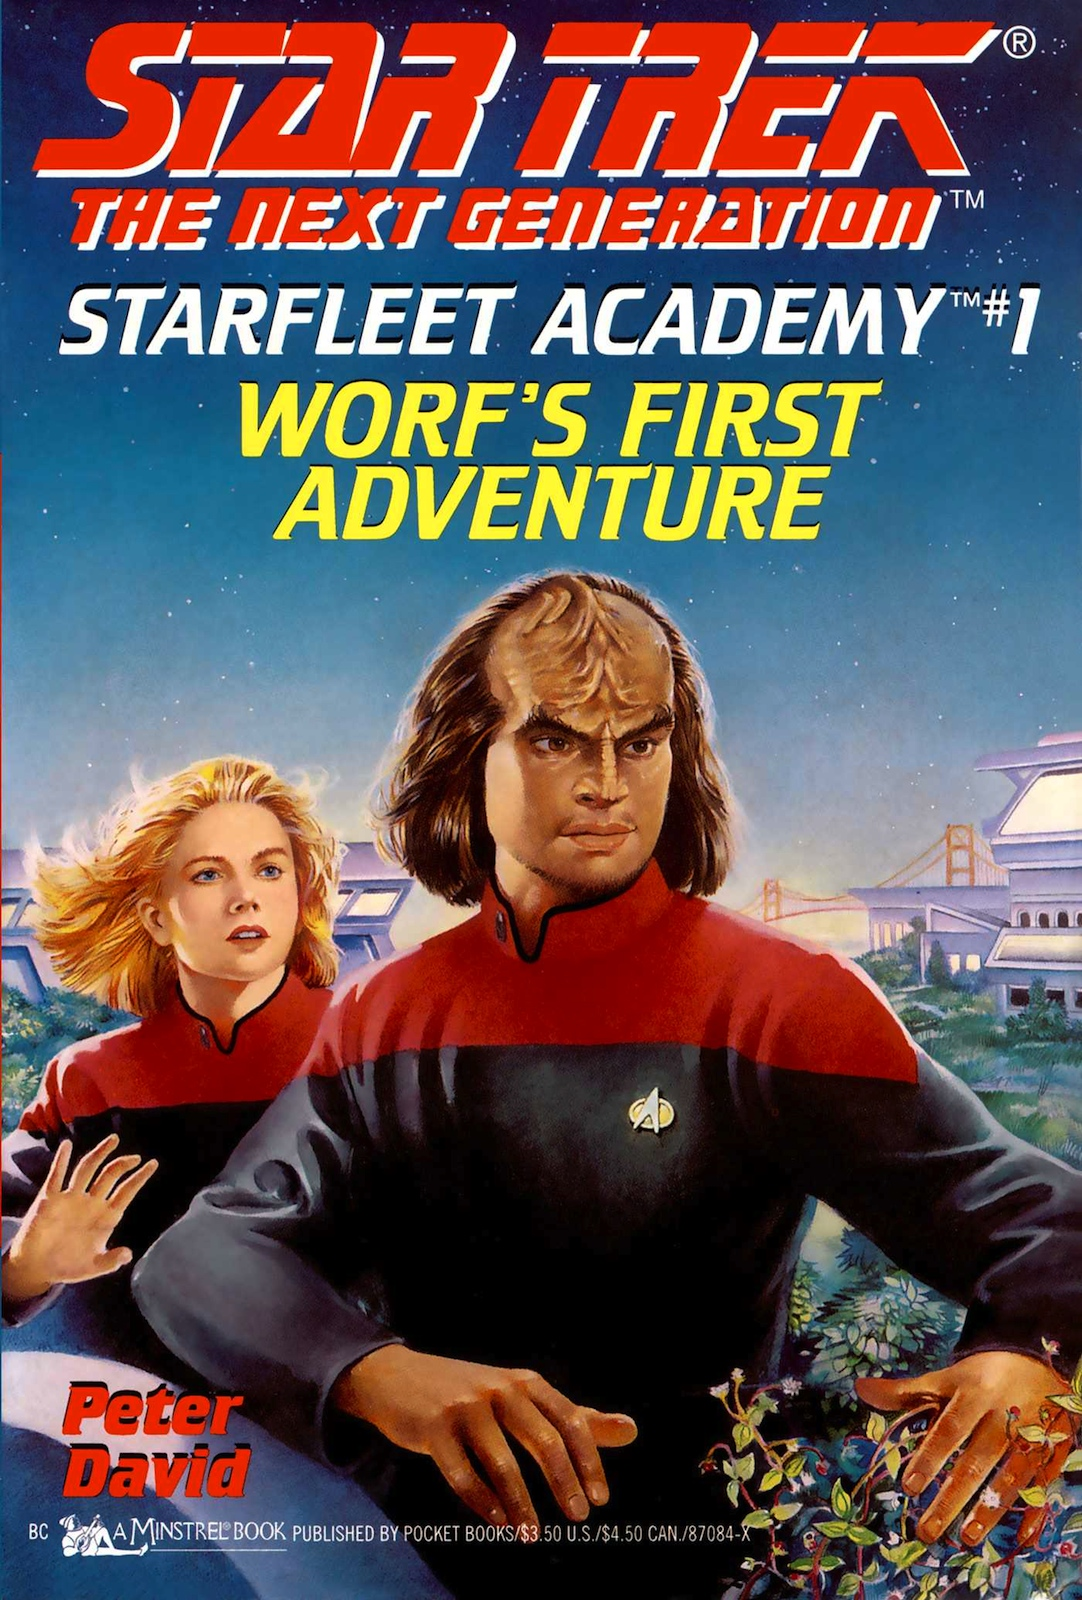 Worf1stadventure